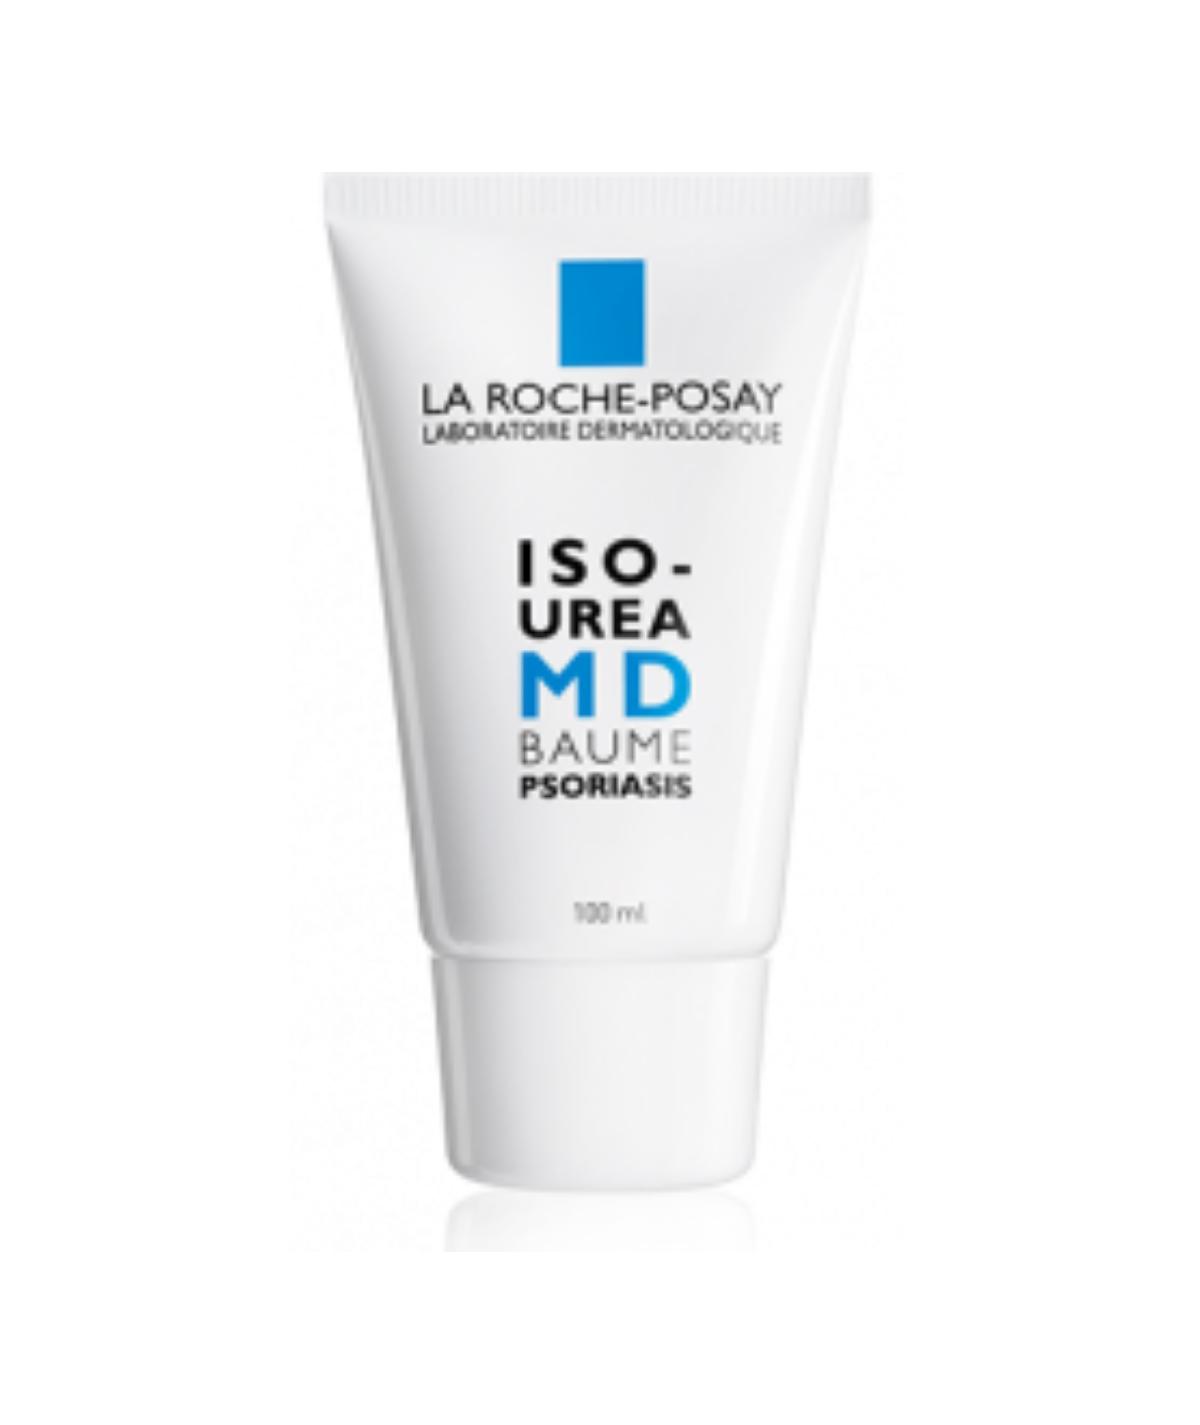 LA ROCHE POSAY ISO-UREA MD BAUME PSORIASIS 100 ML